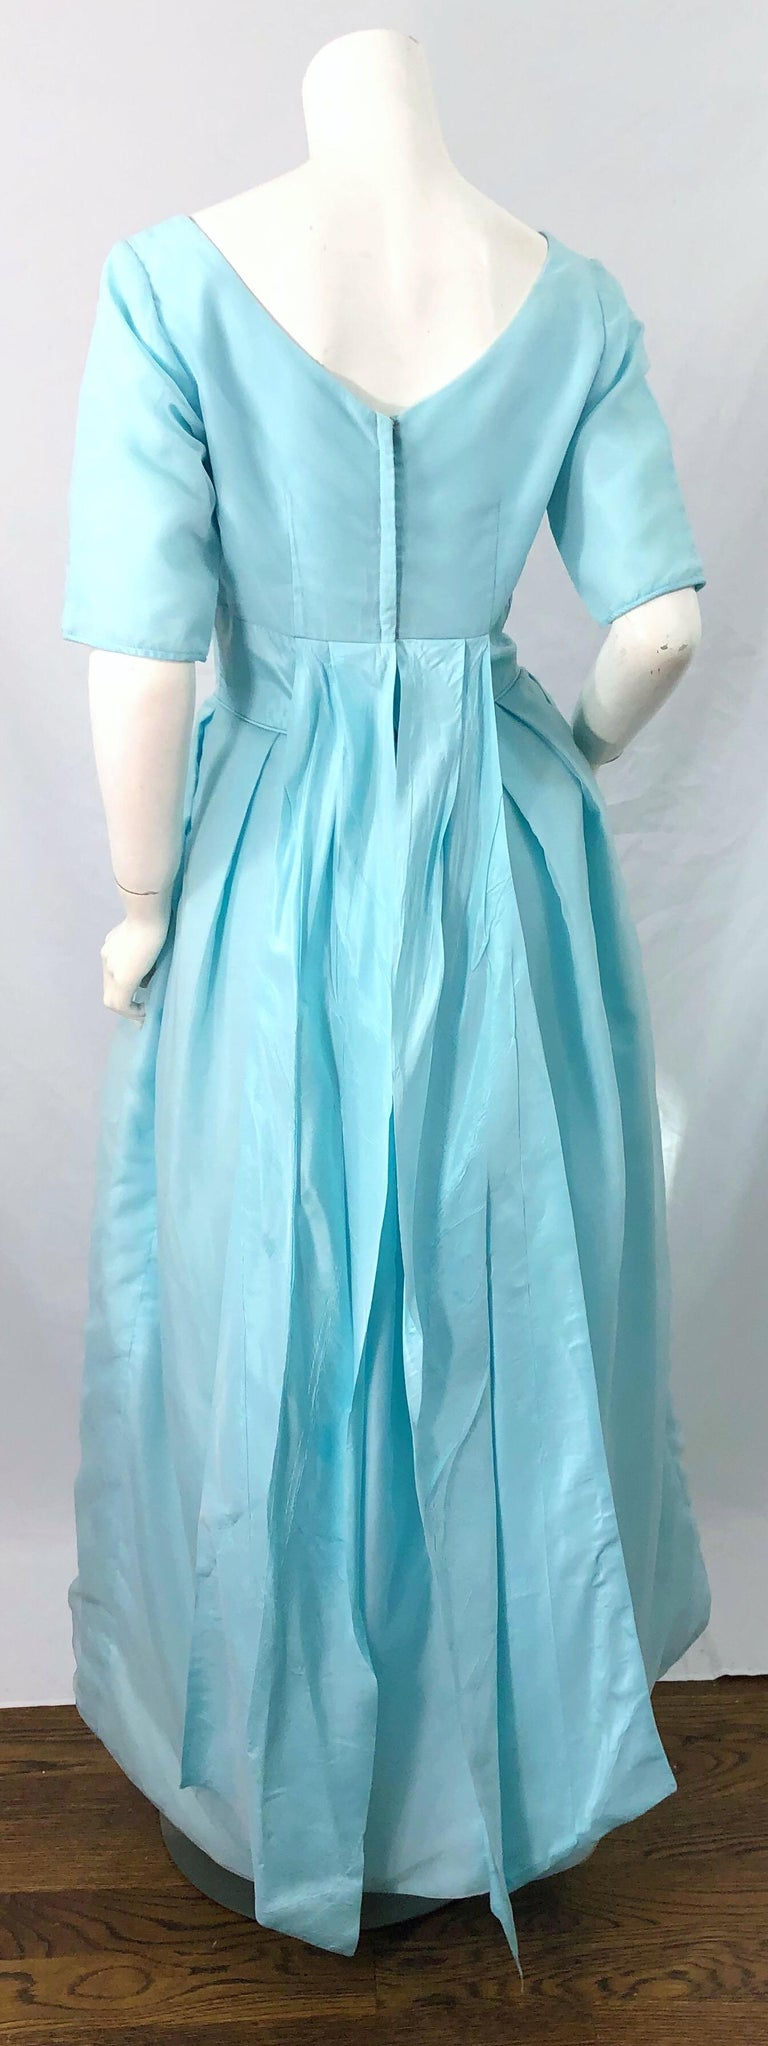 1950s Demi Couture Light Blue Cinderella Silk Chiffon Taffeta 3/4 Sleeves Gown For Sale 5